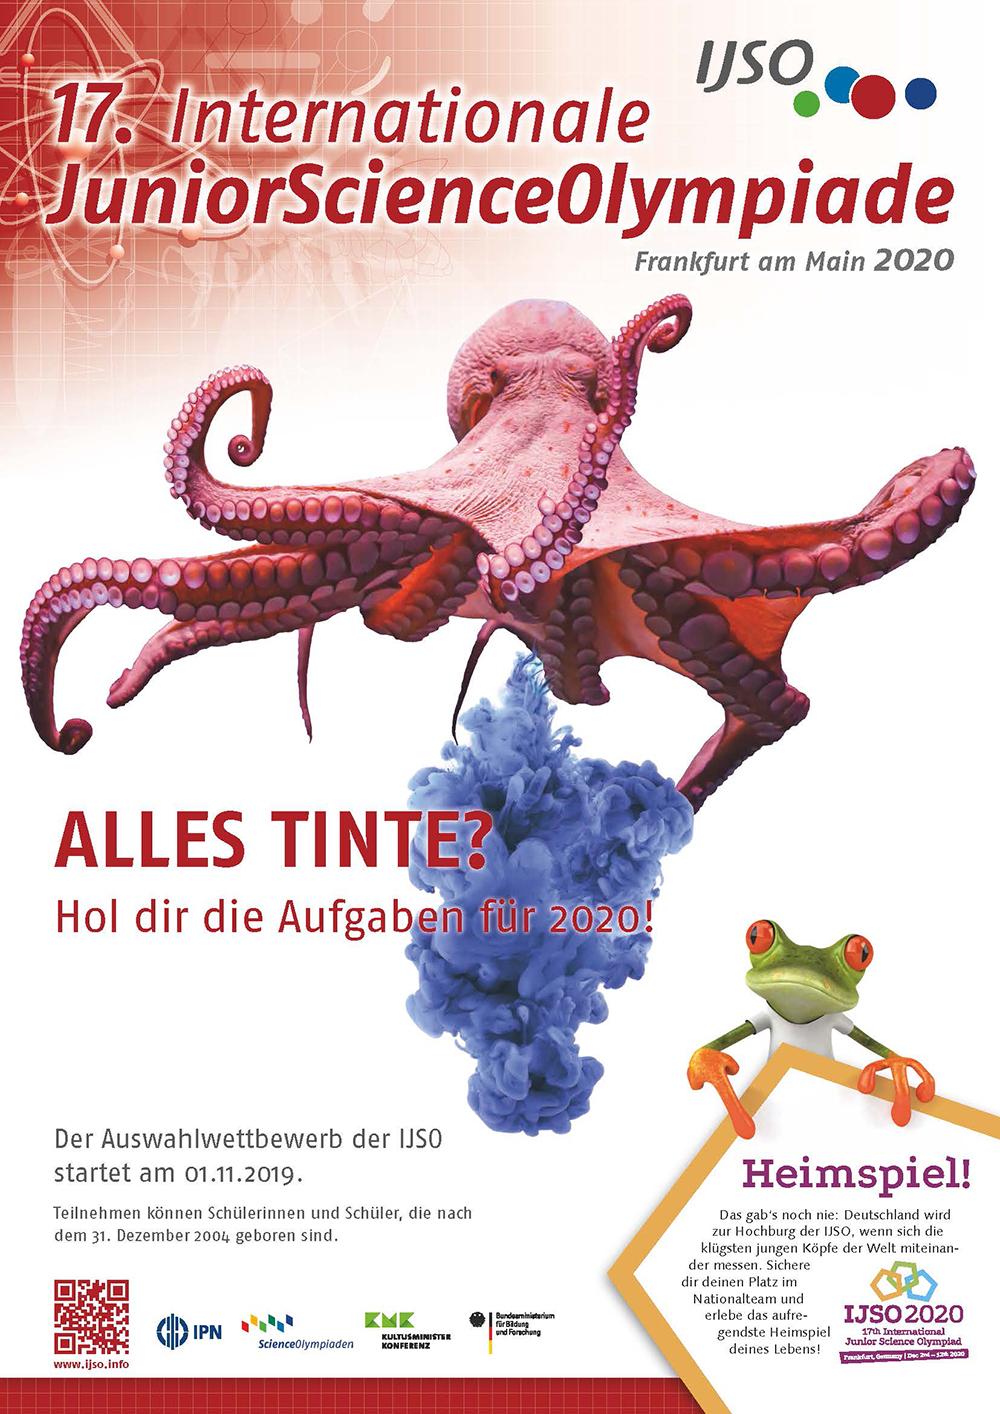 Teilnahmerekord bei der Internationalen JuniorScience Olympiade 2020